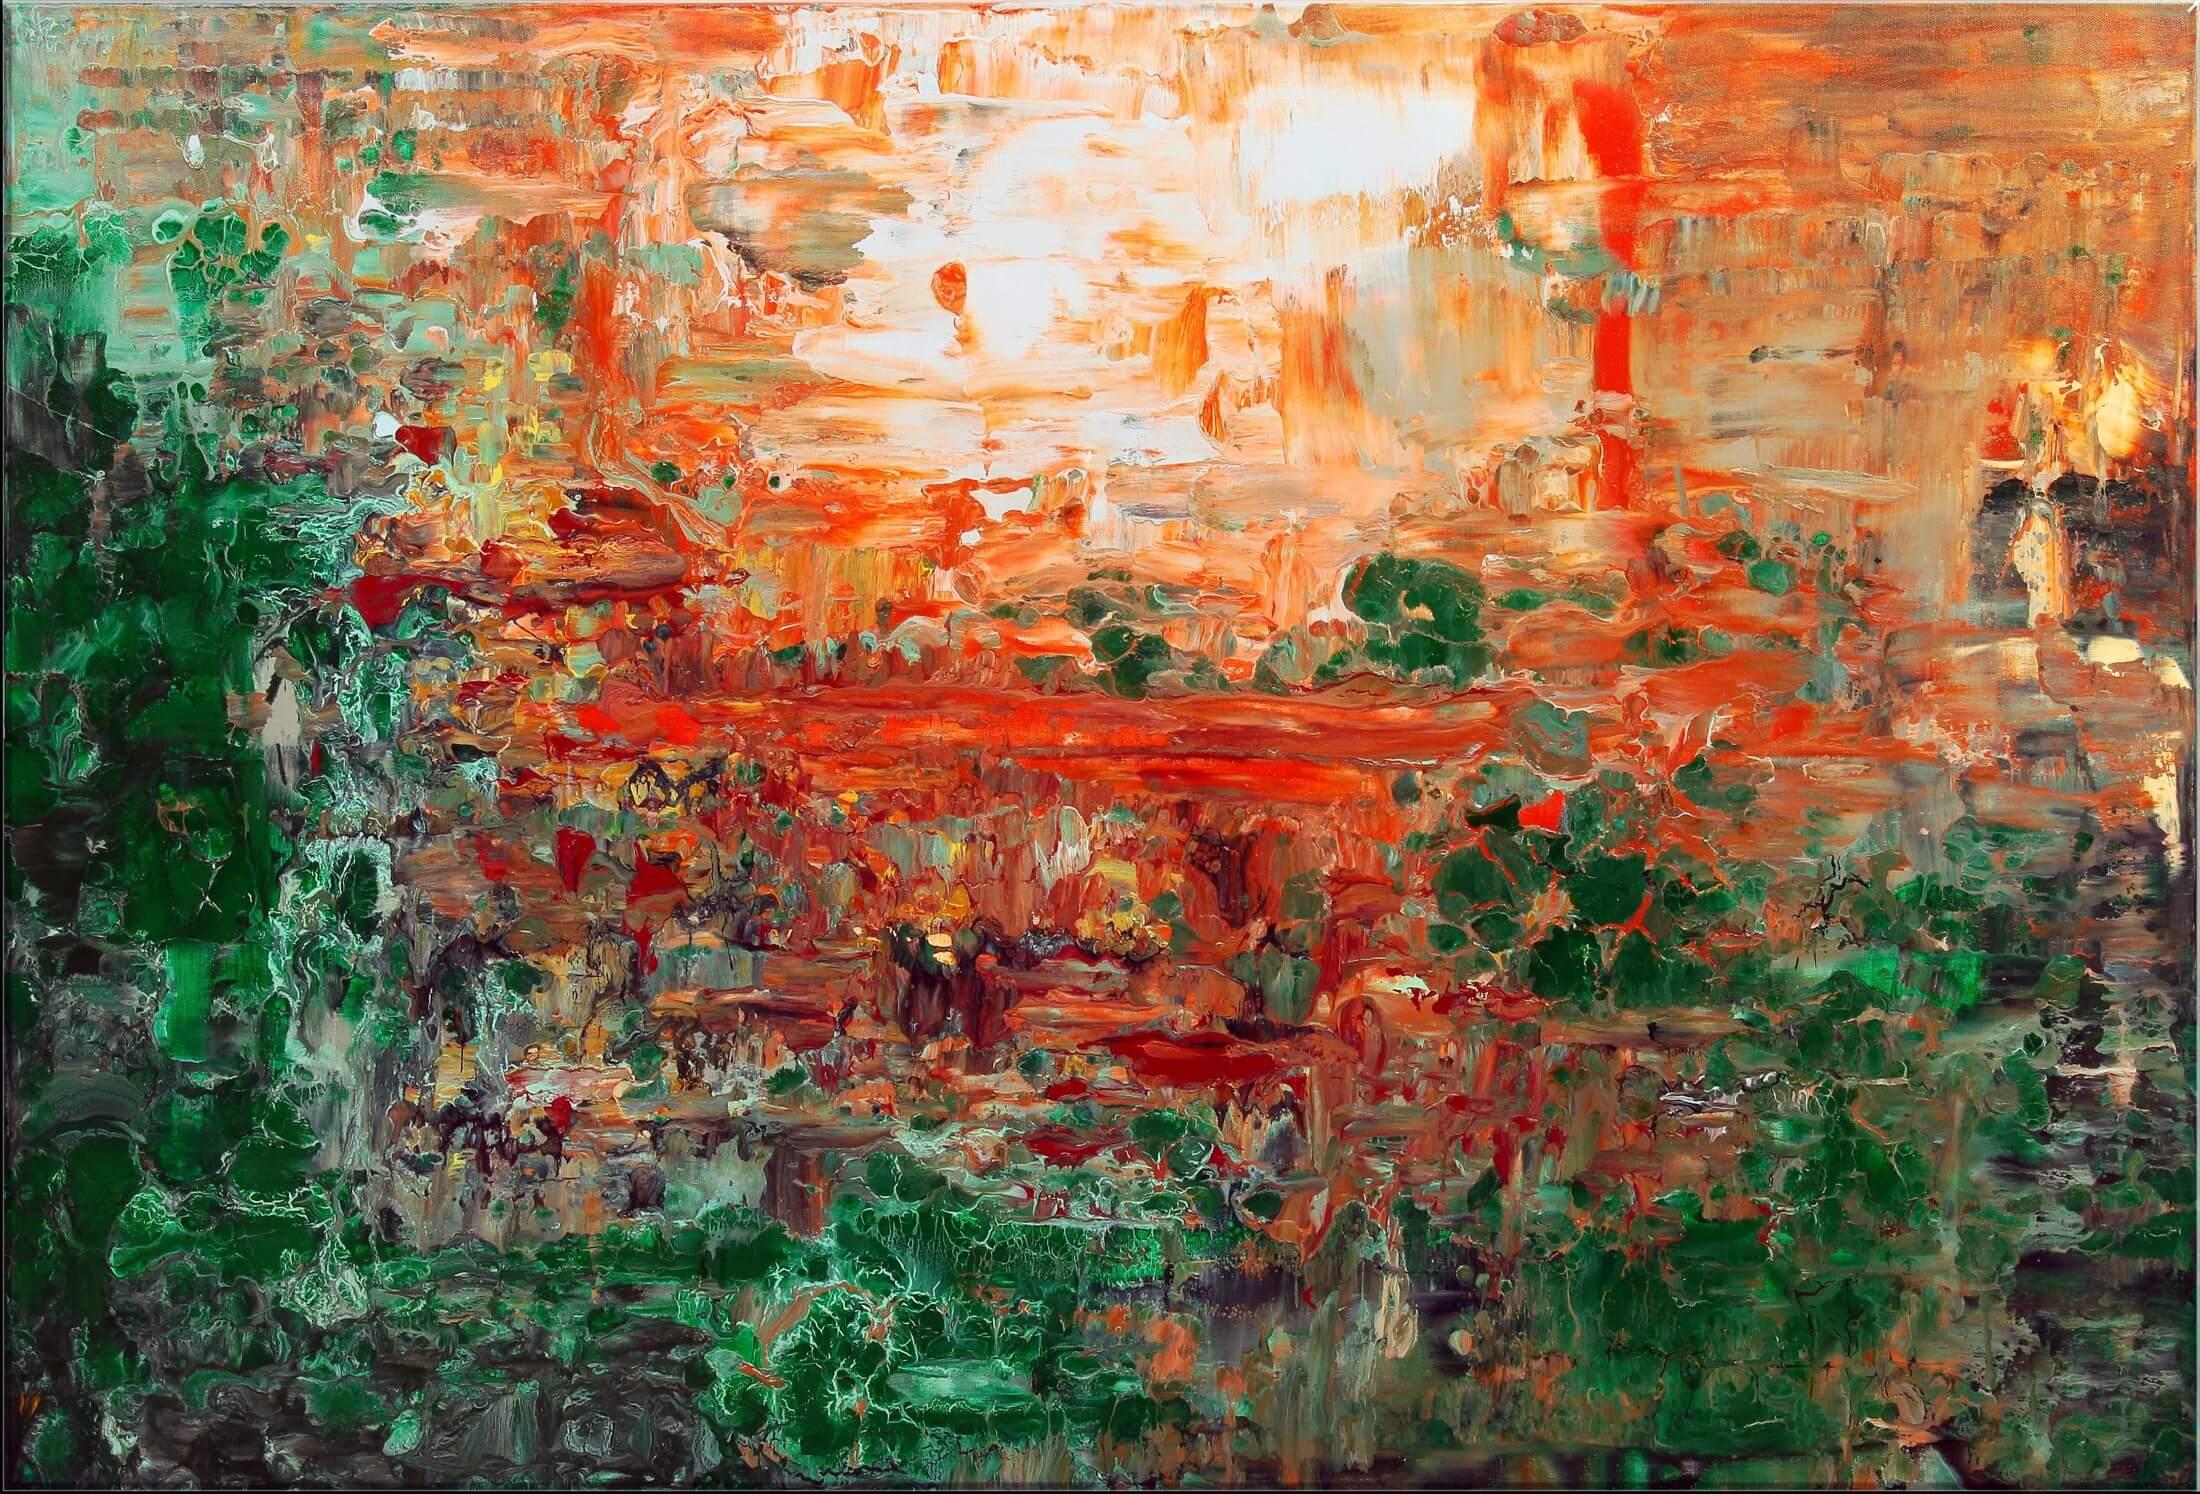 Original Gemälde von Noah de Jong Orangene Insel